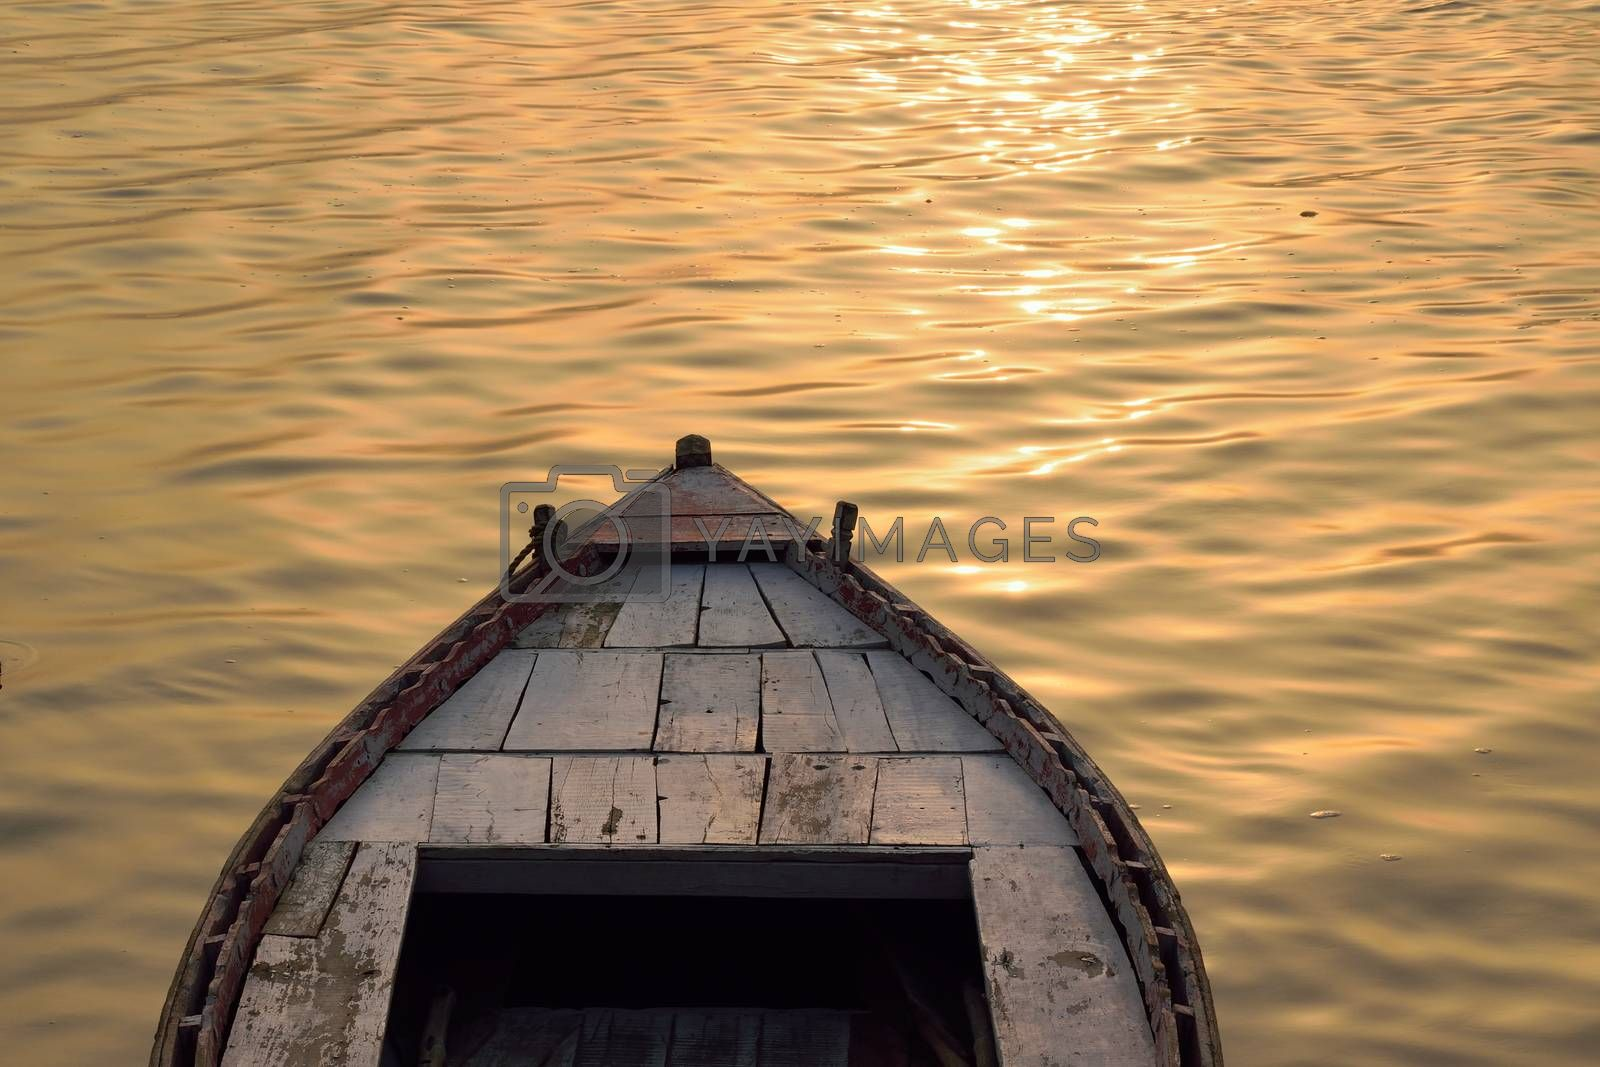 Travel Background Boat Ride at Ganges river in Varanasi, India in horizontal frame